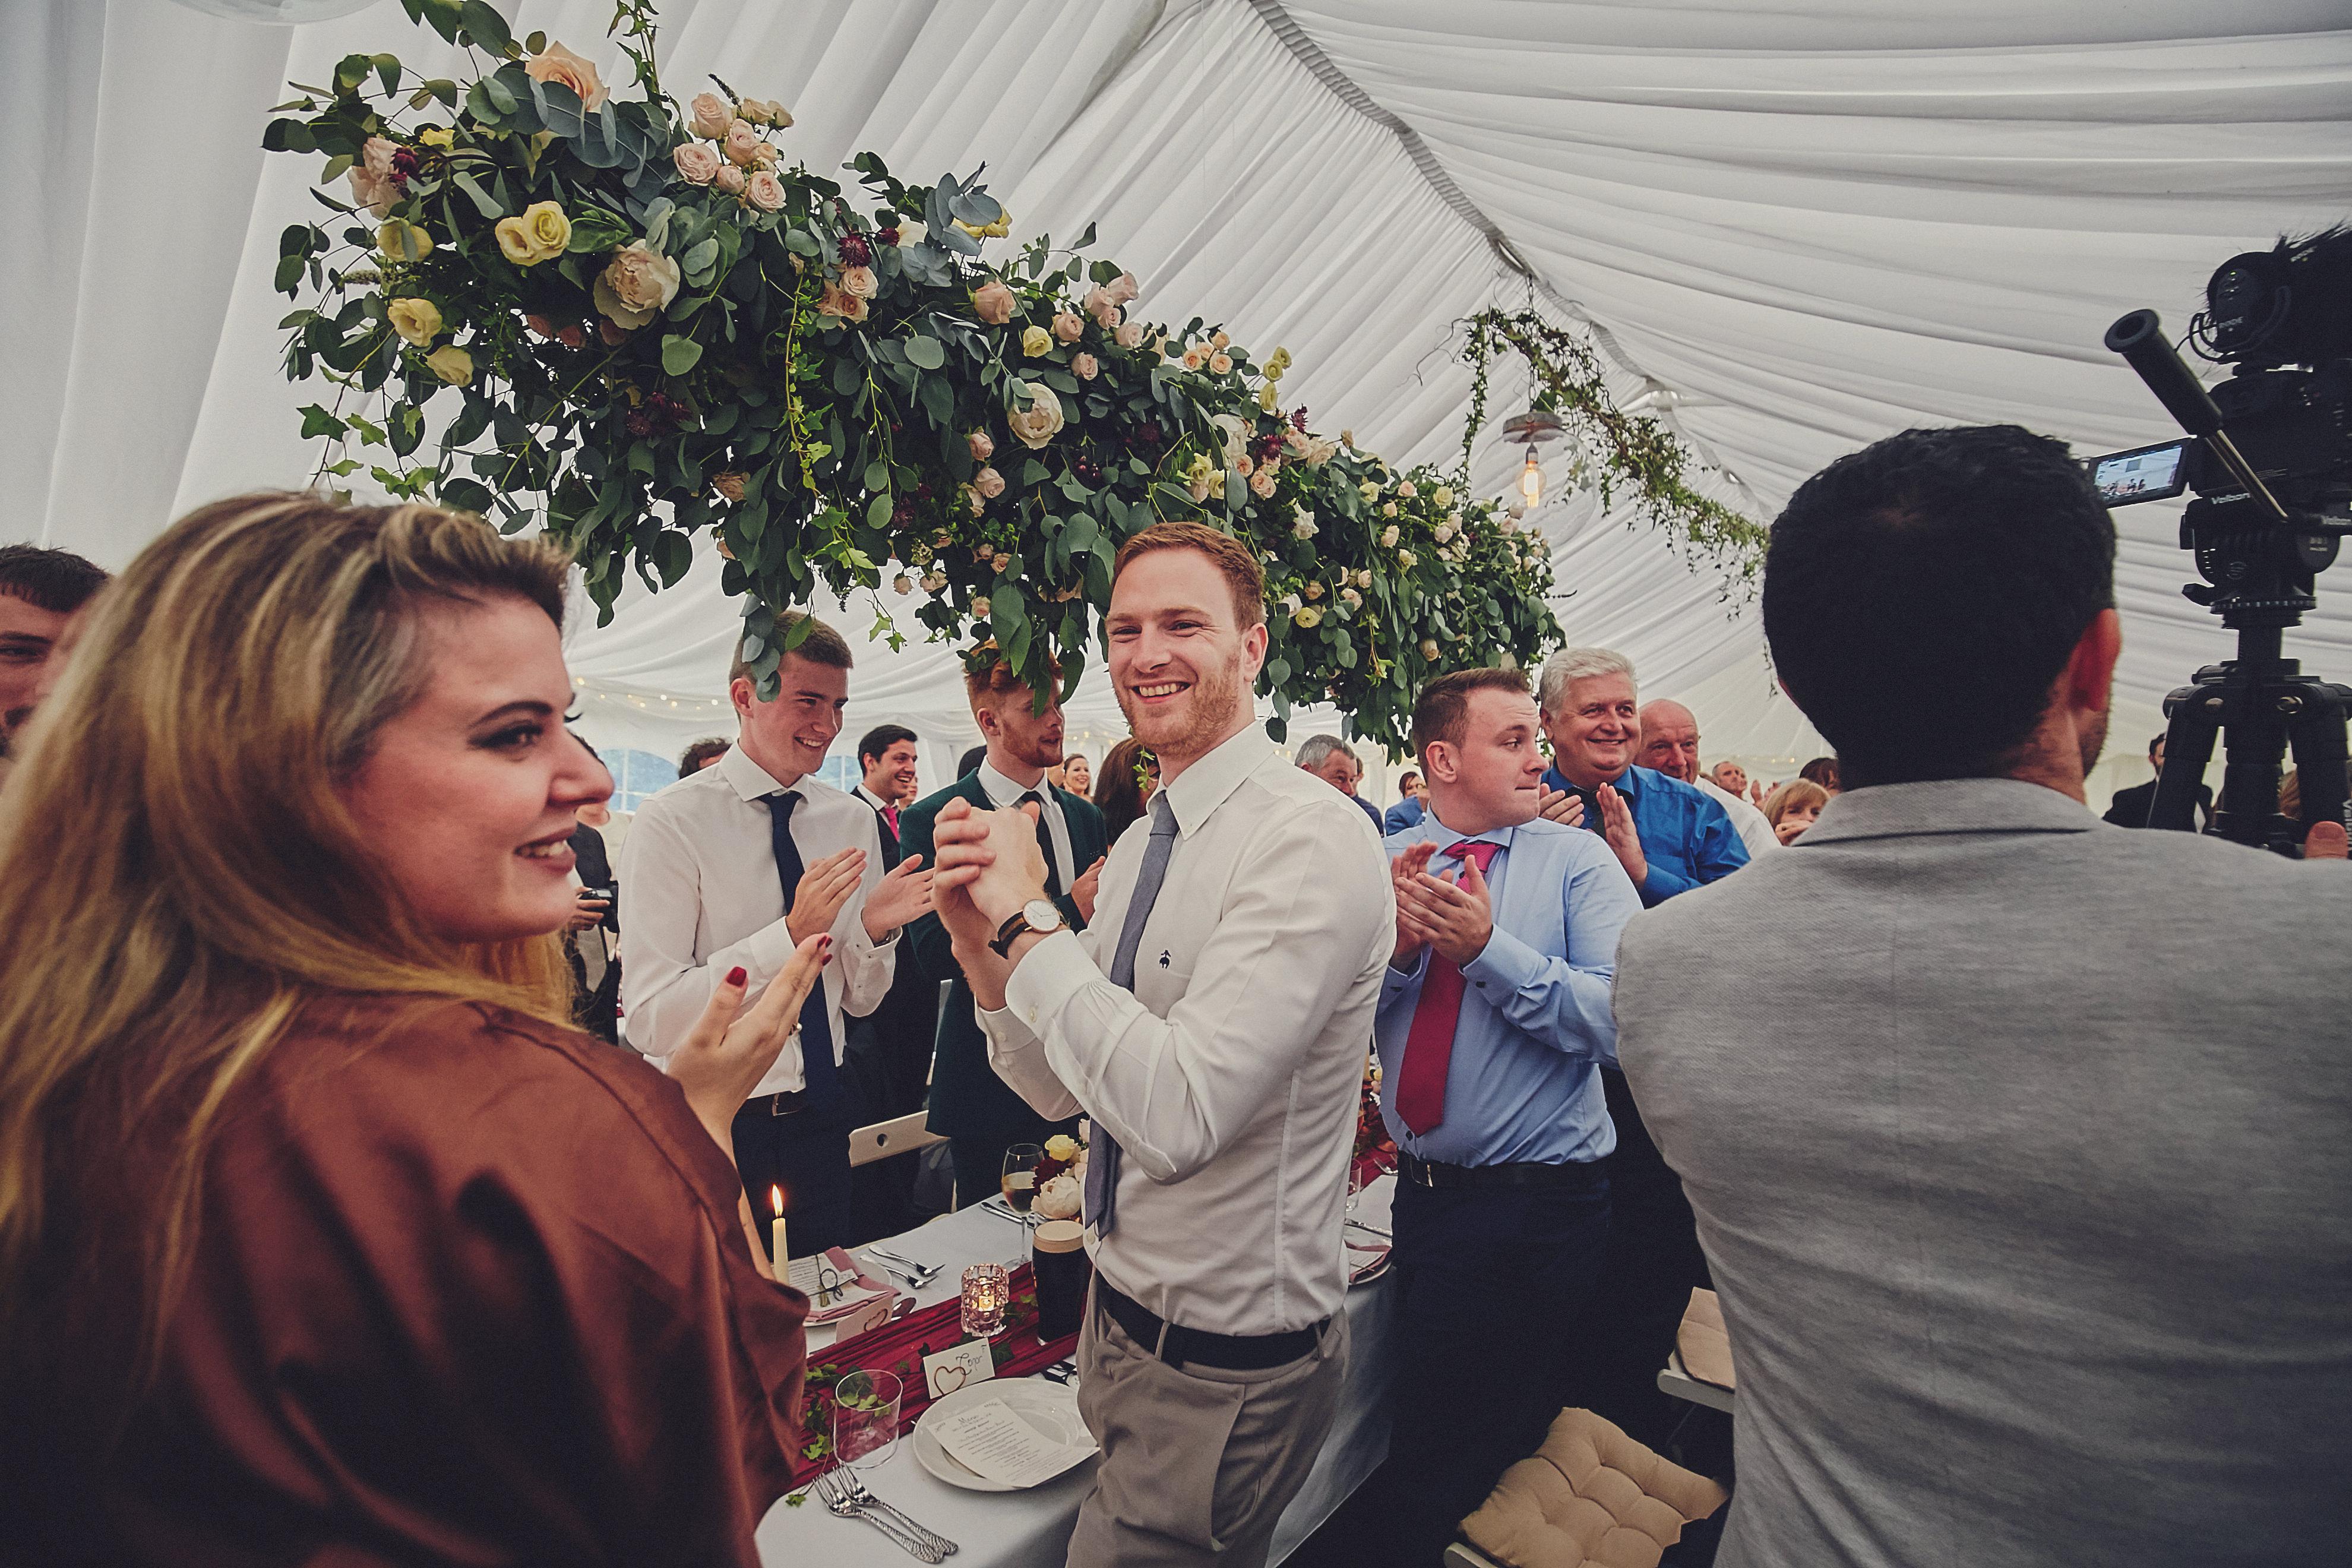 Cloughjordan House weddding129 - Cloughjordan House Wedding - Alternative Venue